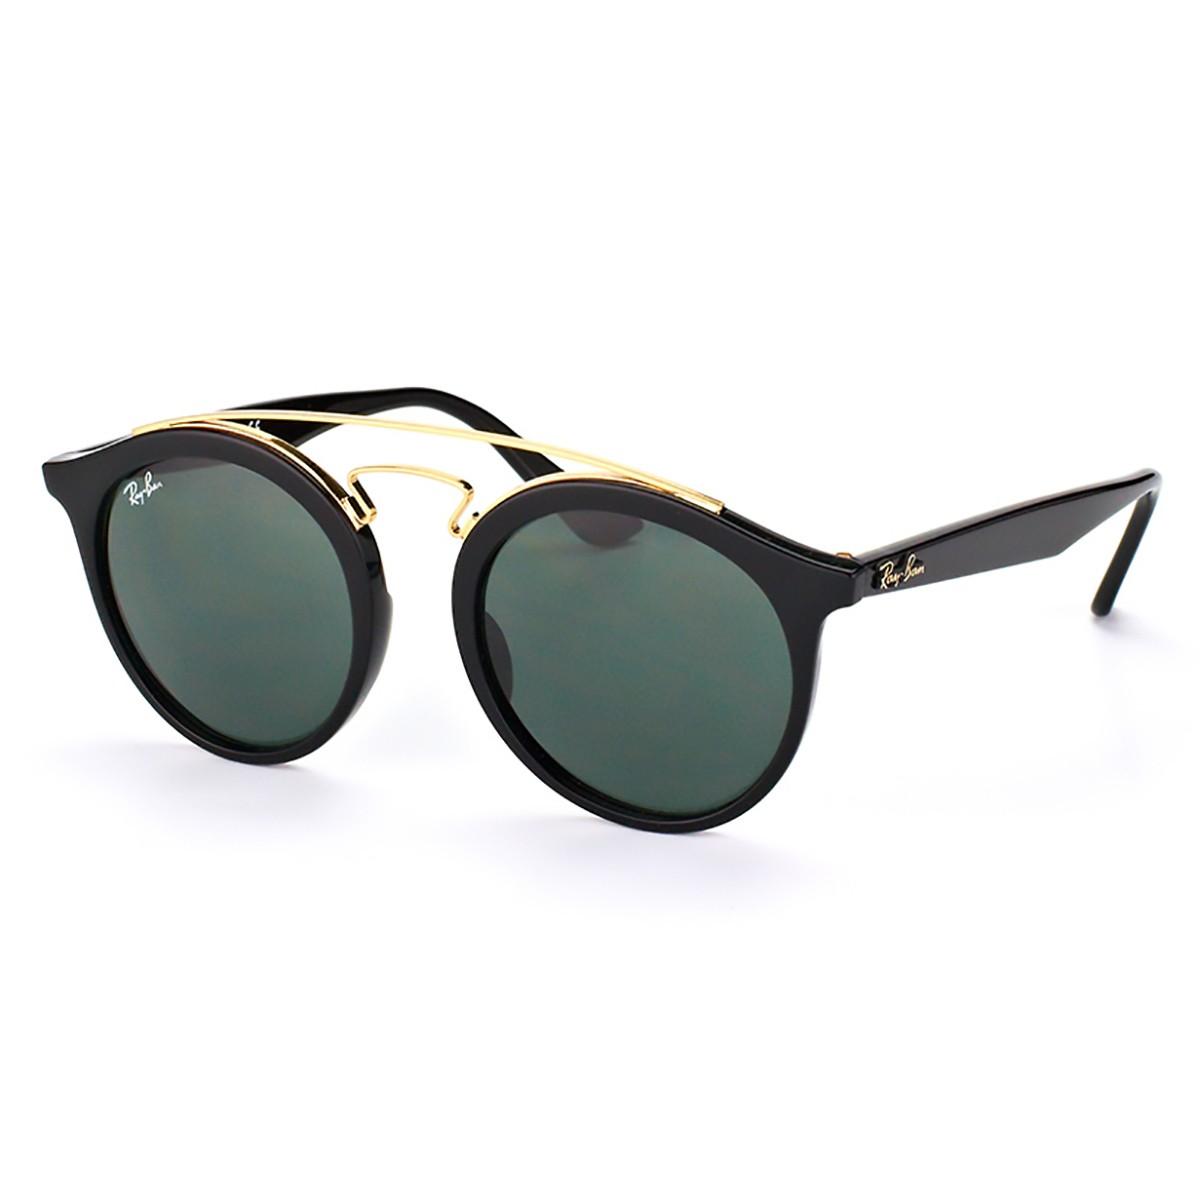 Compre Óculos de Sol Ray Ban Gatsby Redondo em 10X   Tri-Jóia Shop 1844498955